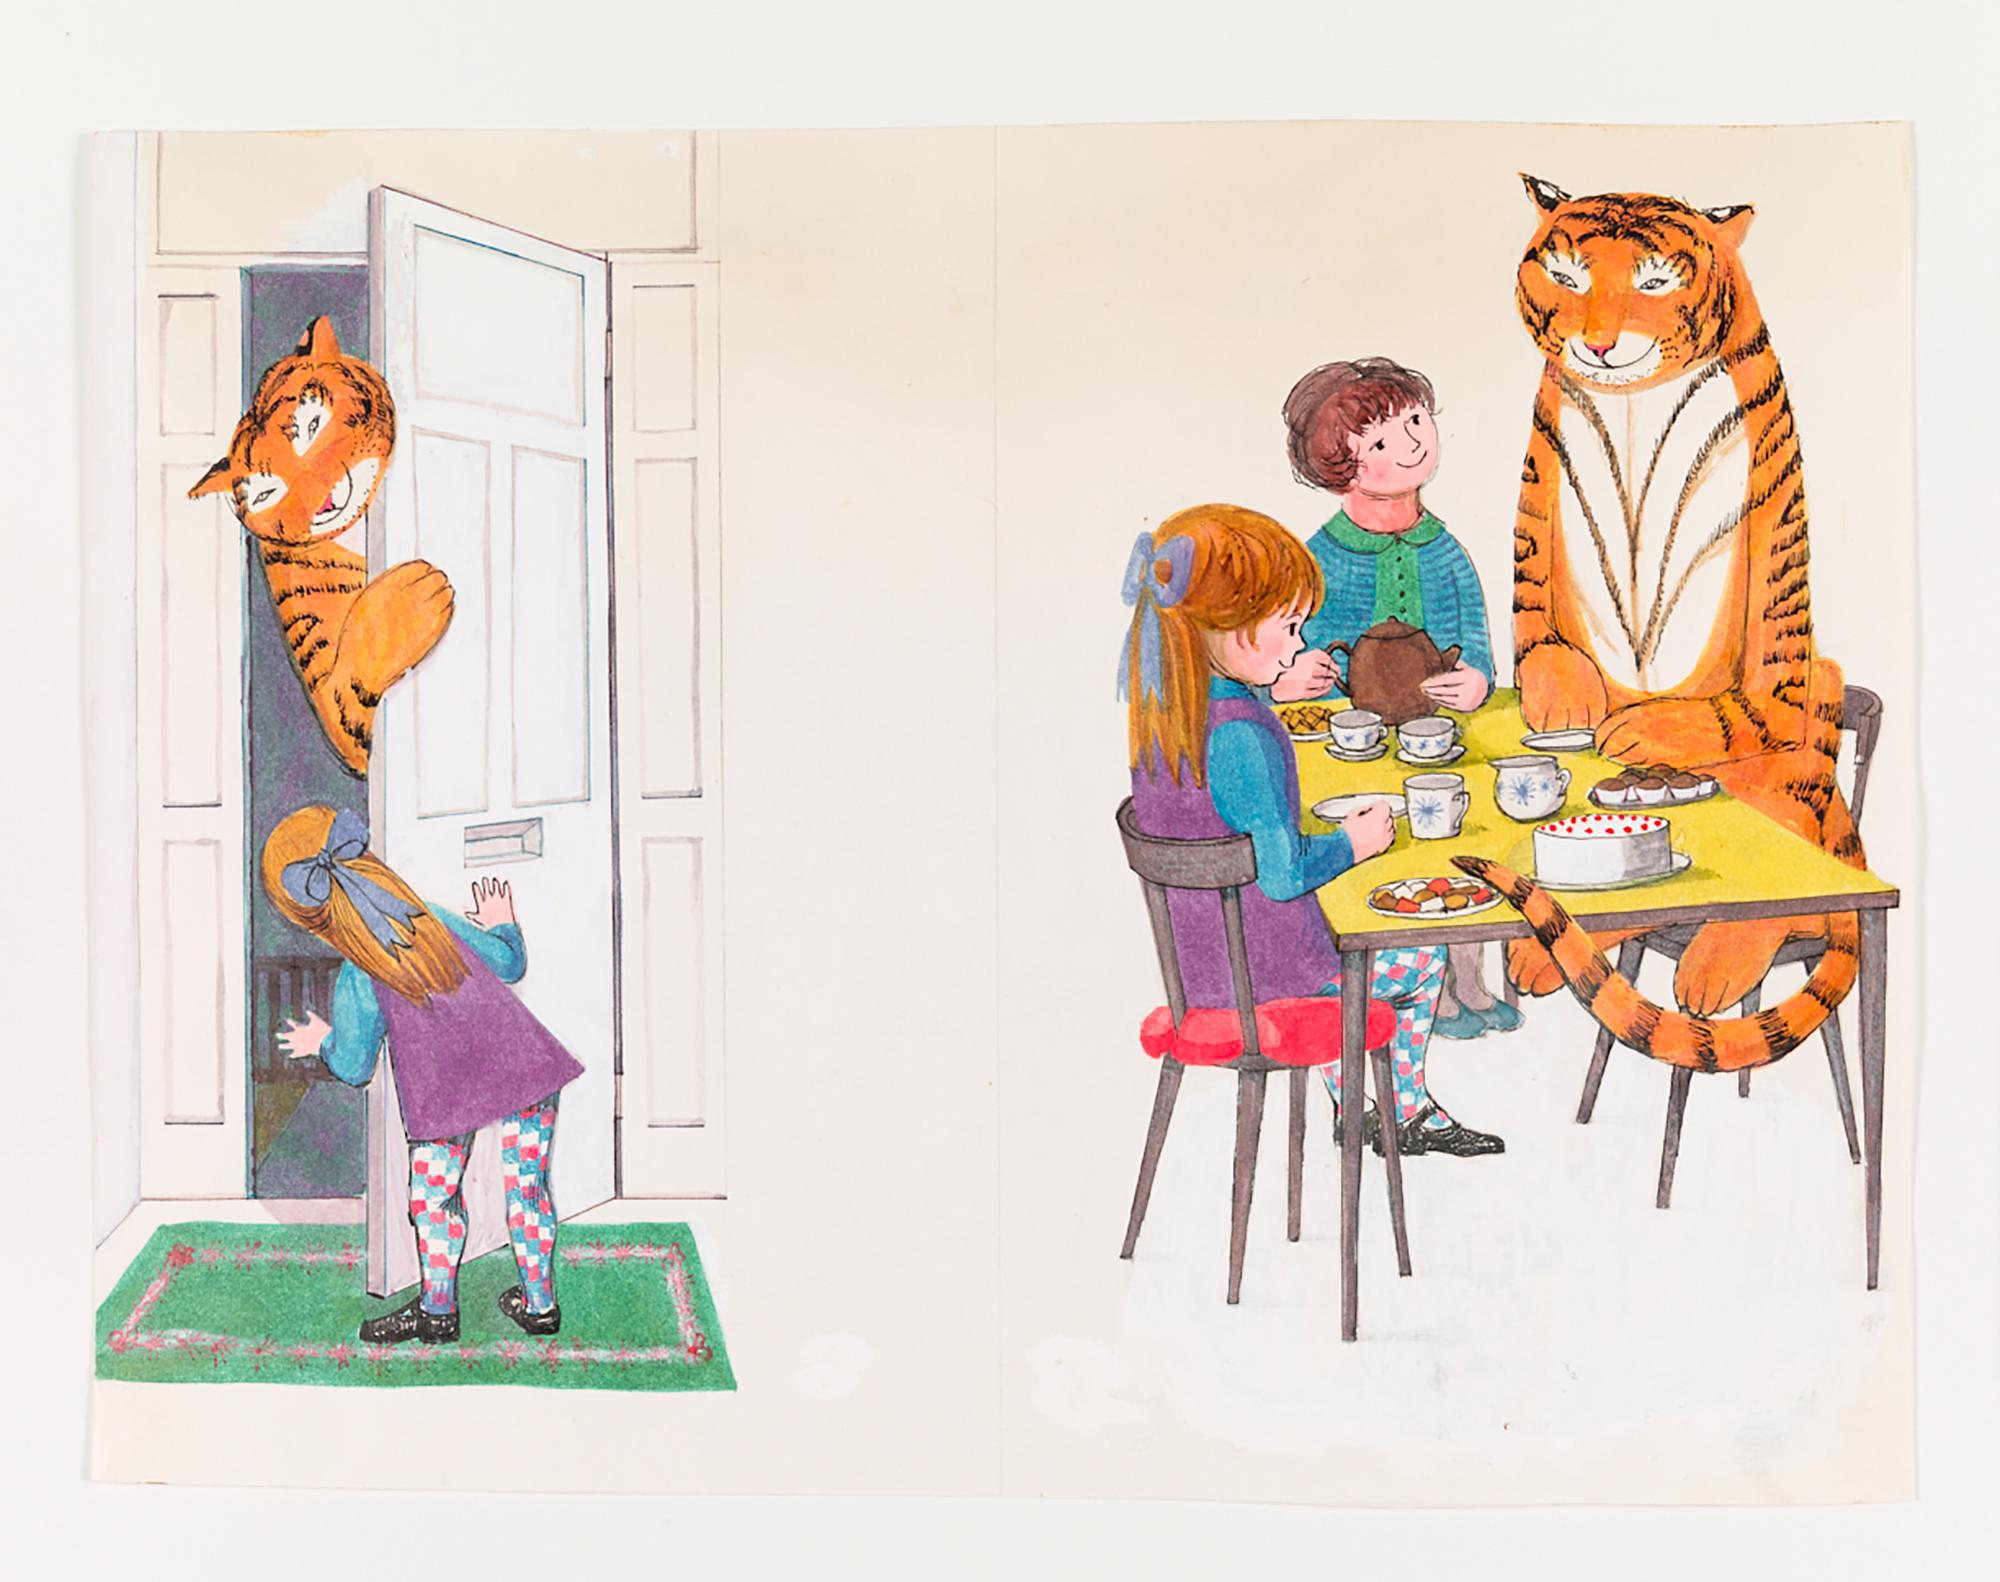 Tiger-Tea-7-STORIES-JK_03_01_02_04.jpg